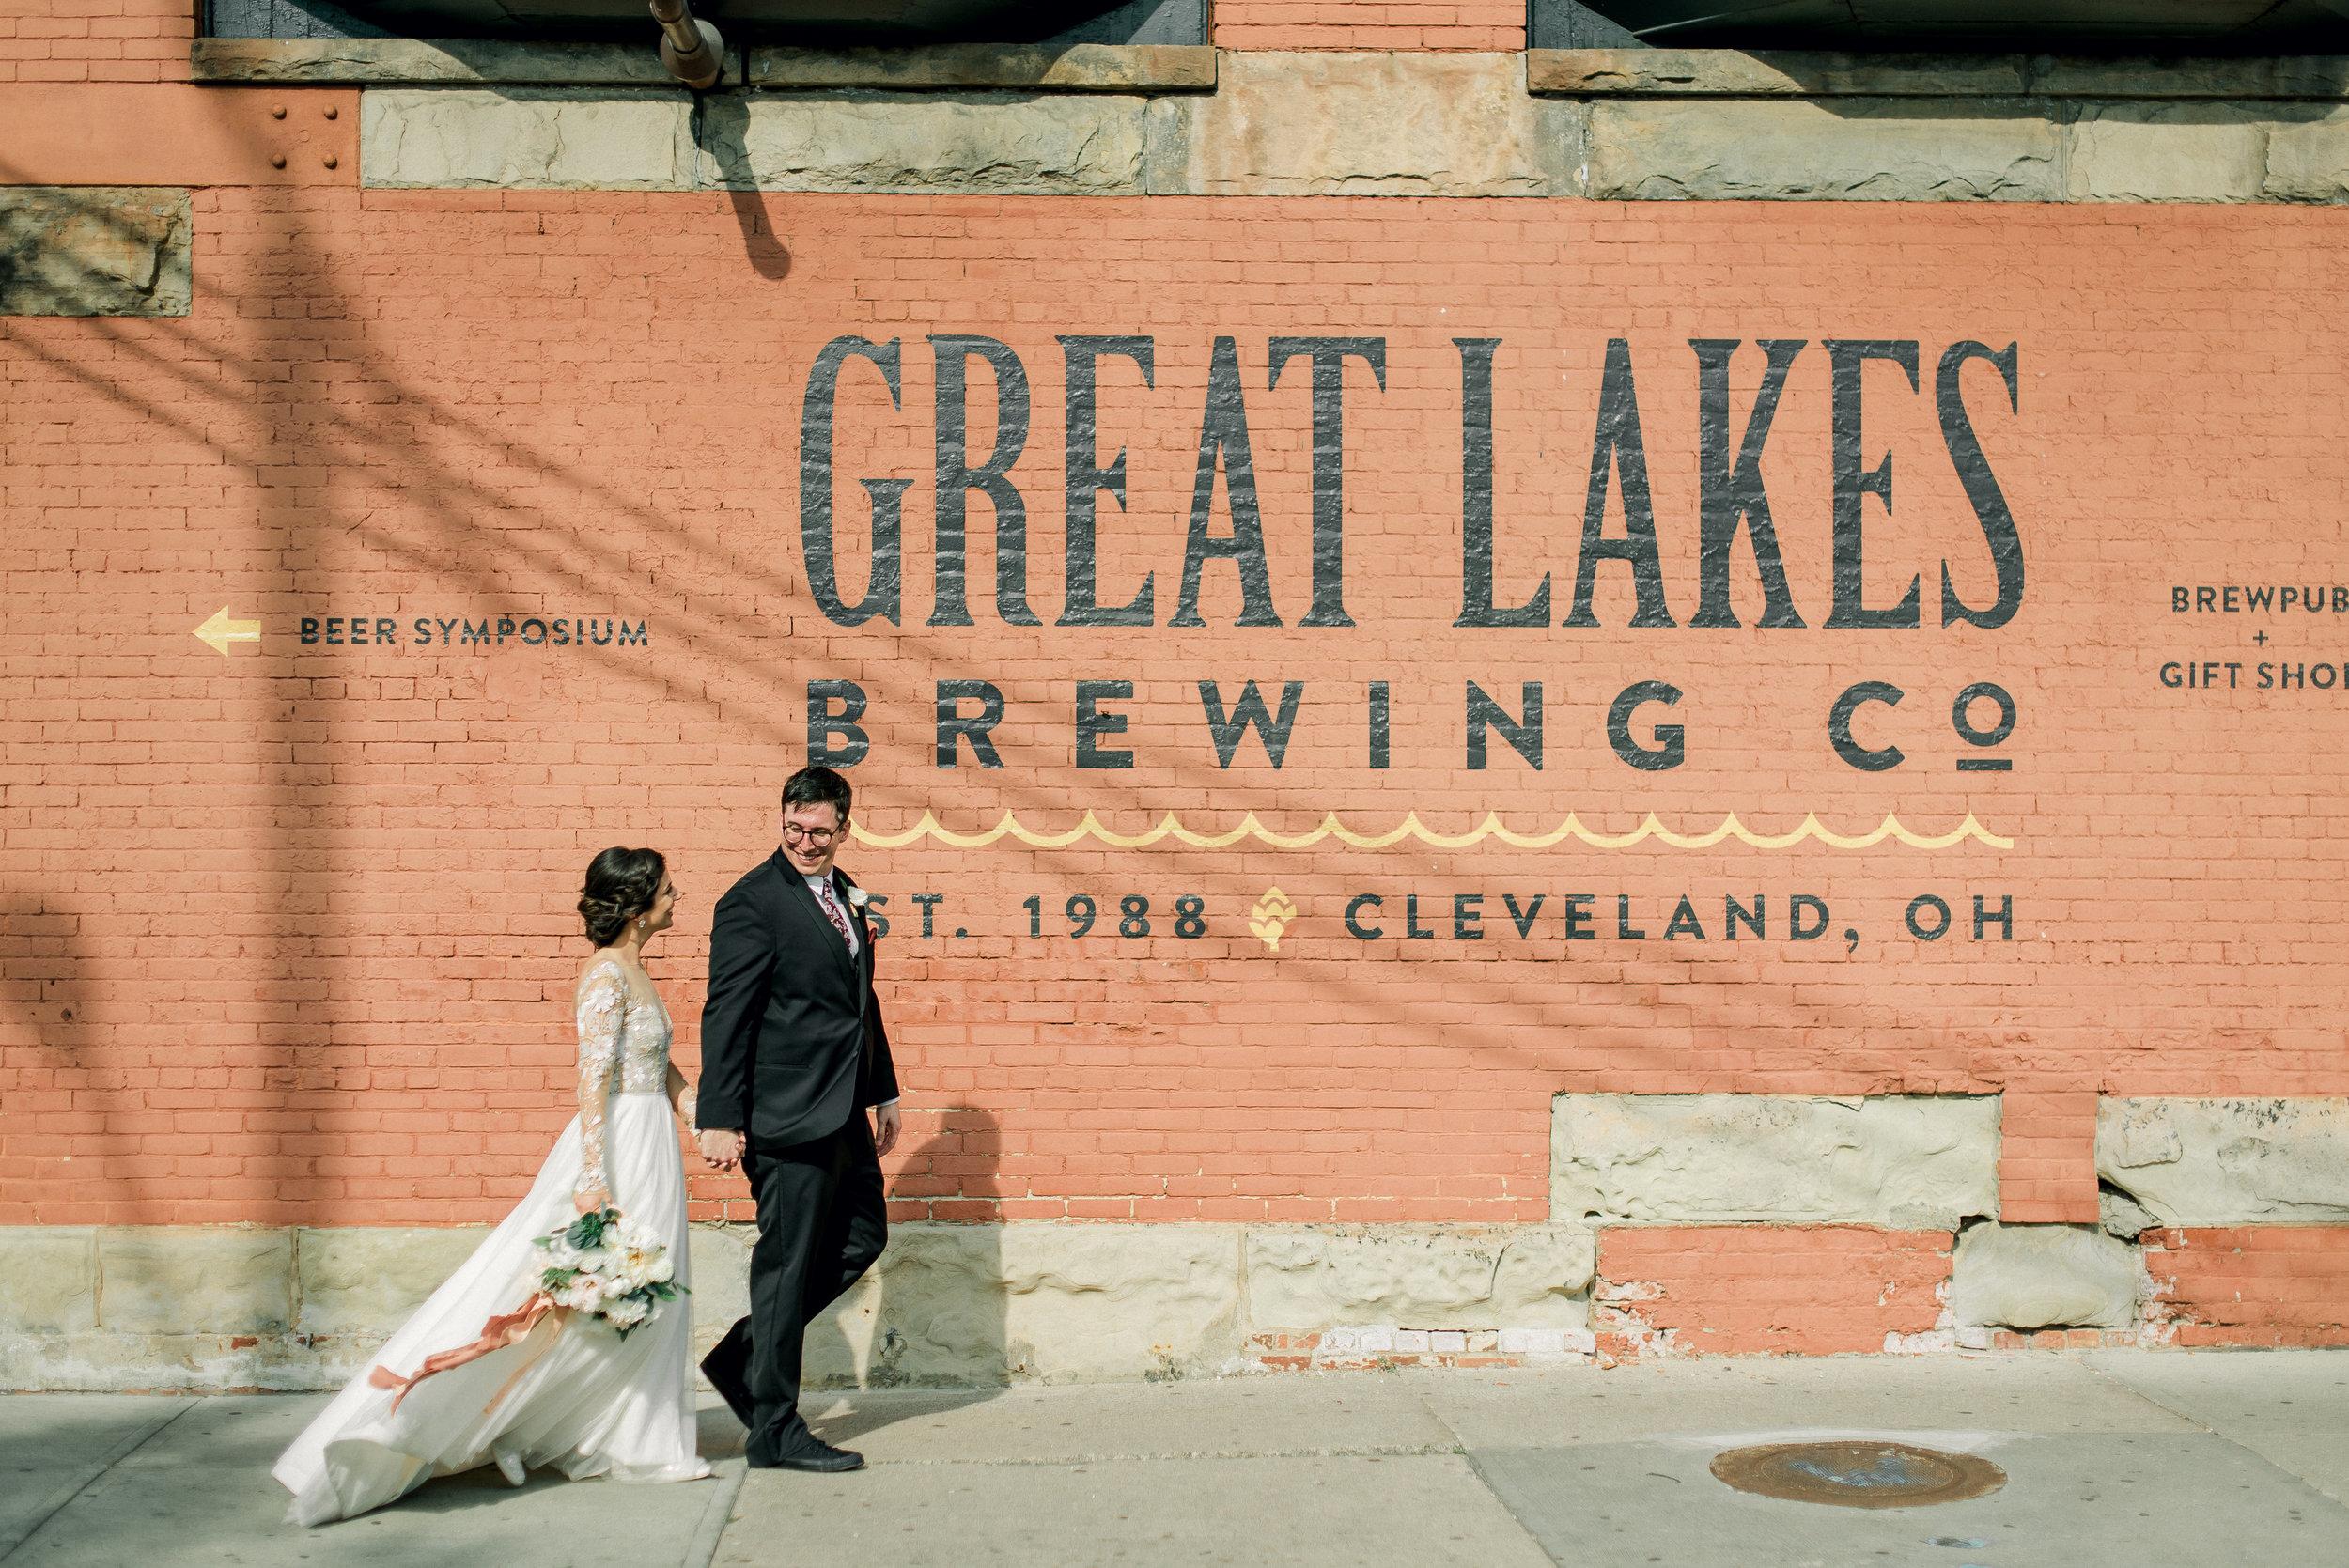 cleveland-wedding-photographer-great-lakes-brewing-arcade-0060.jpg